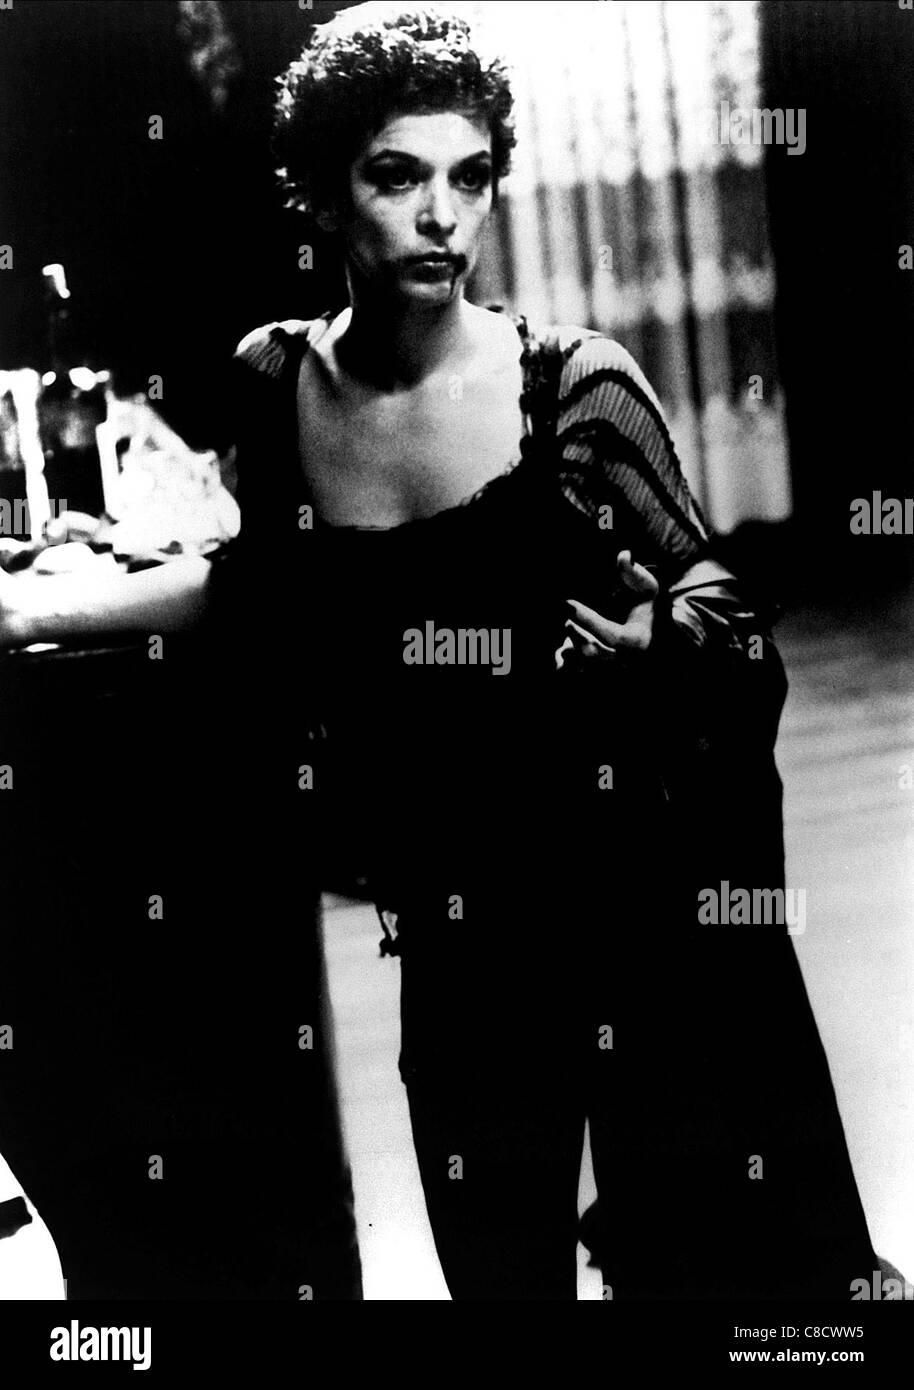 ANNABELLA SCIORRA THE ADDICTION (1995) - Stock Image